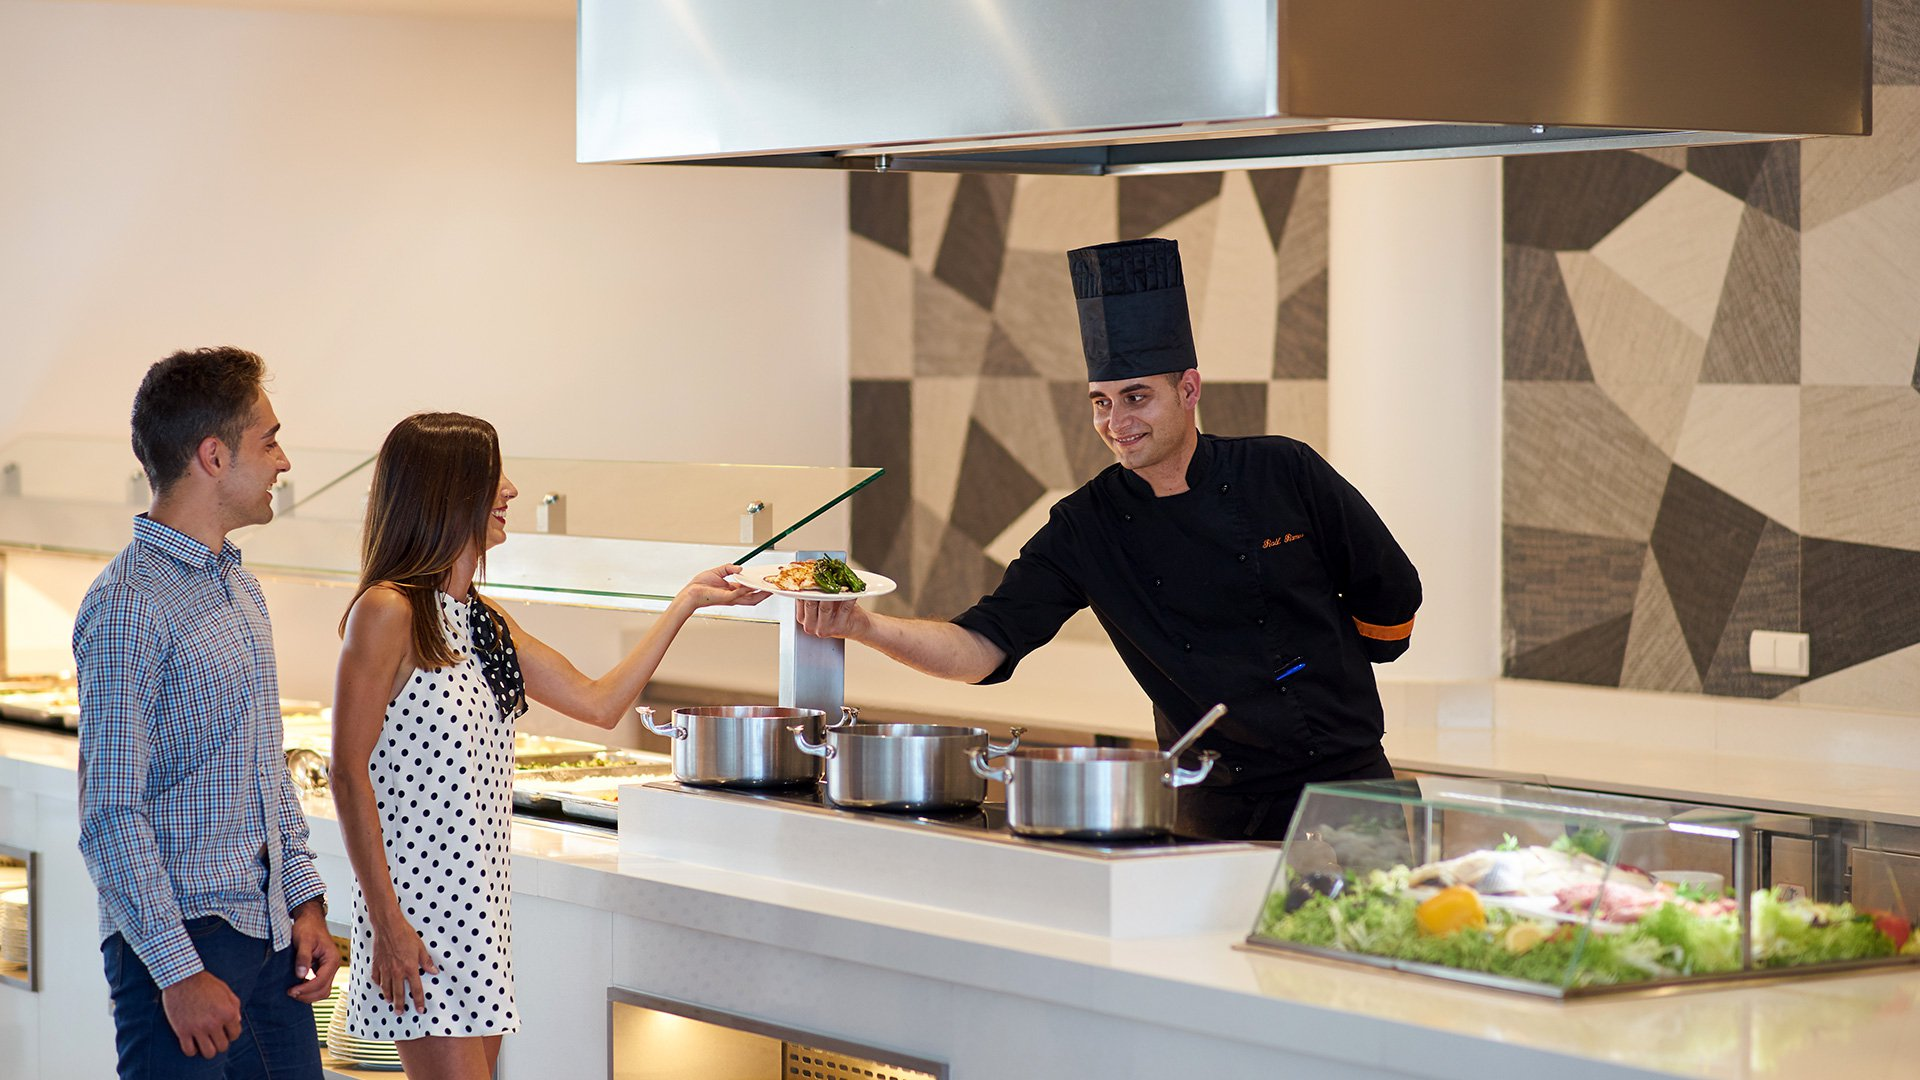 Buffetrestaurant mit Show-Cooking